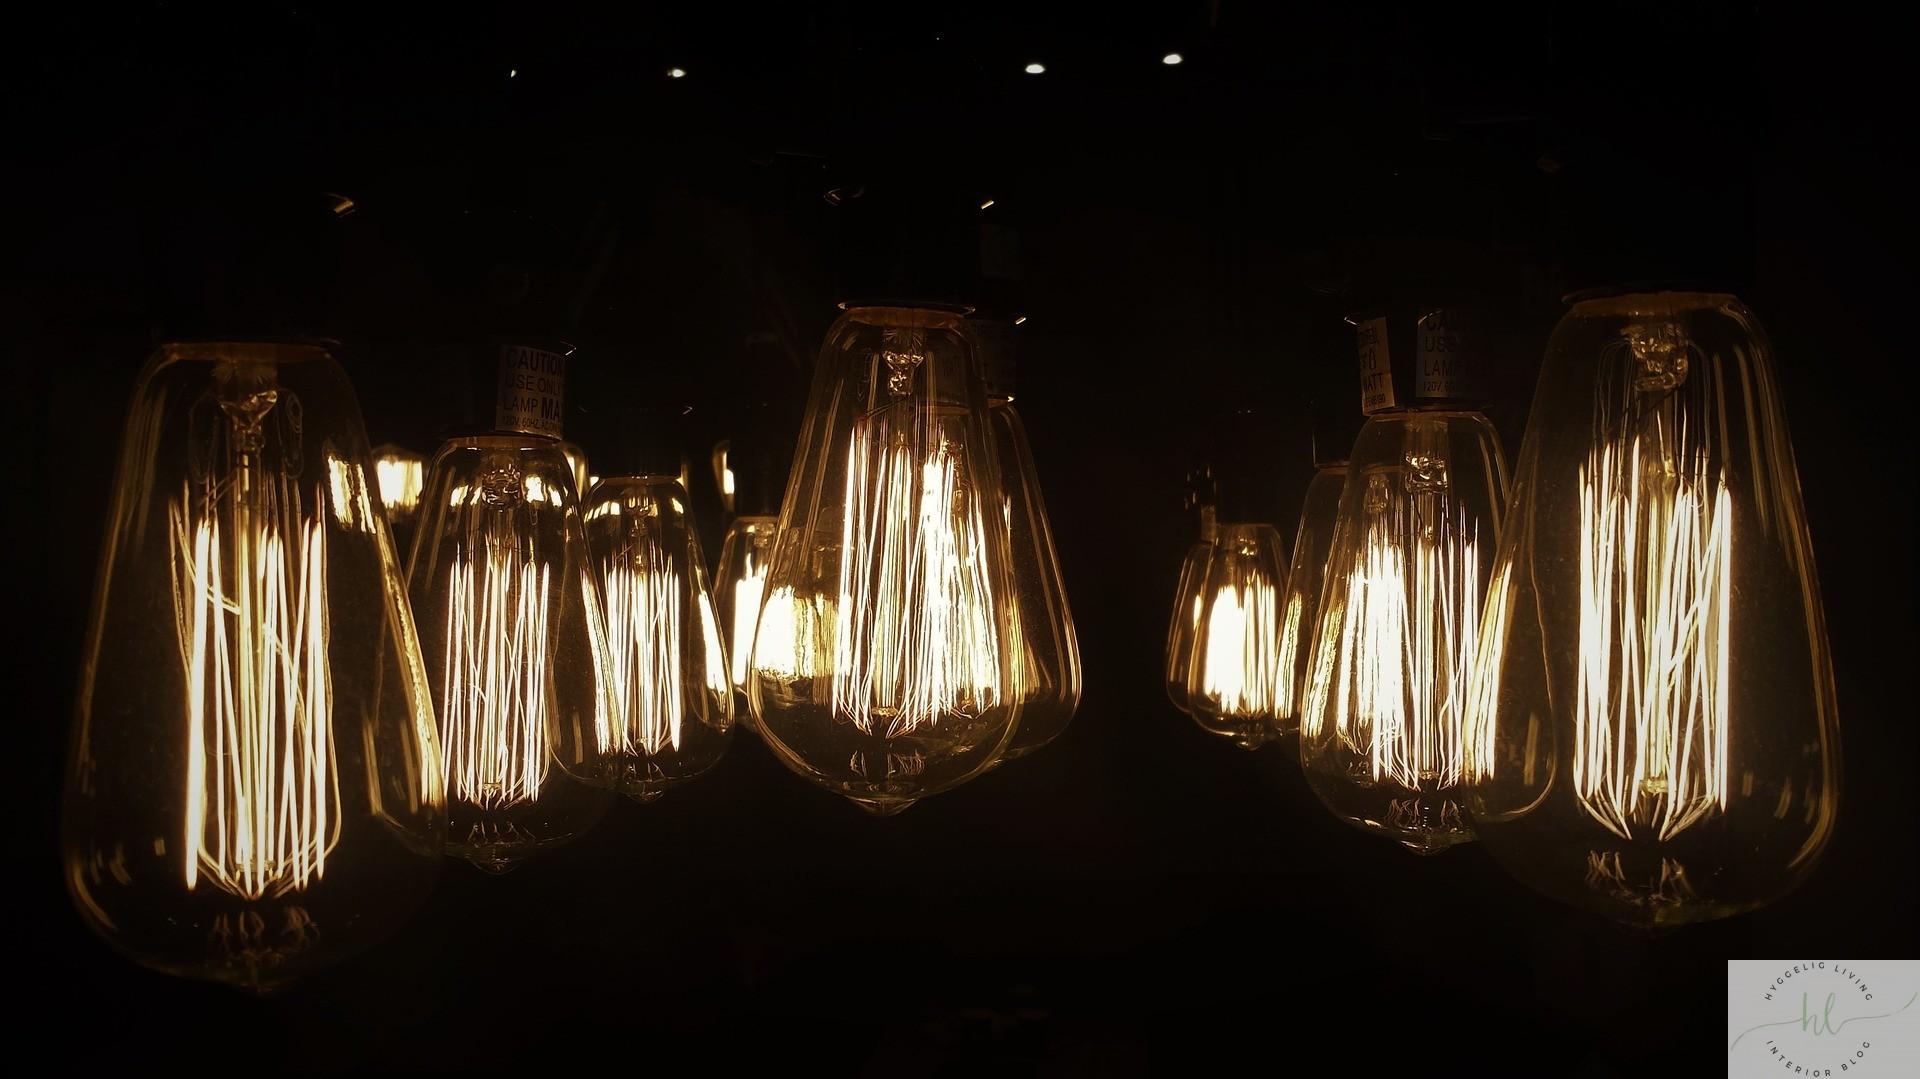 Klick Licht hygge durch gute beleuchtung click licht hyggelig living